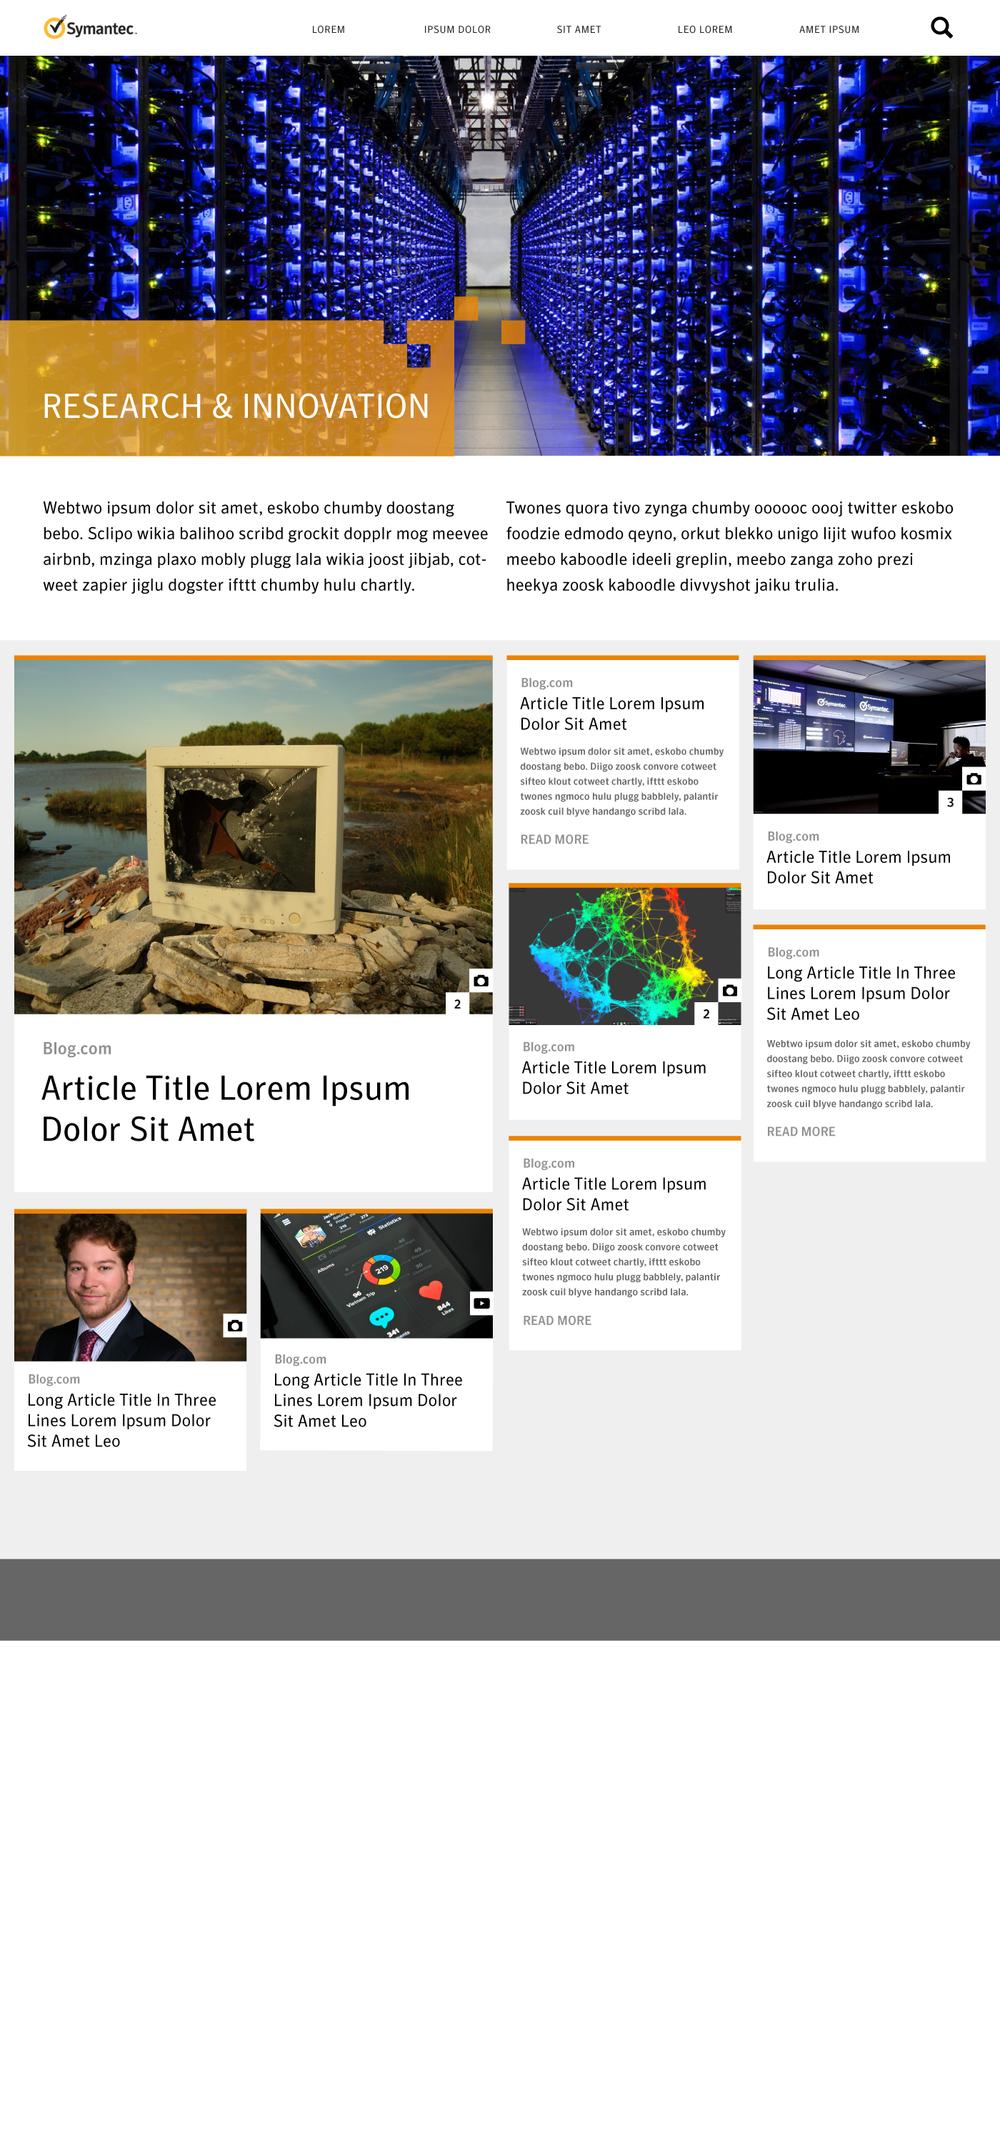 Symantec_Newsroom_01_02.jpg